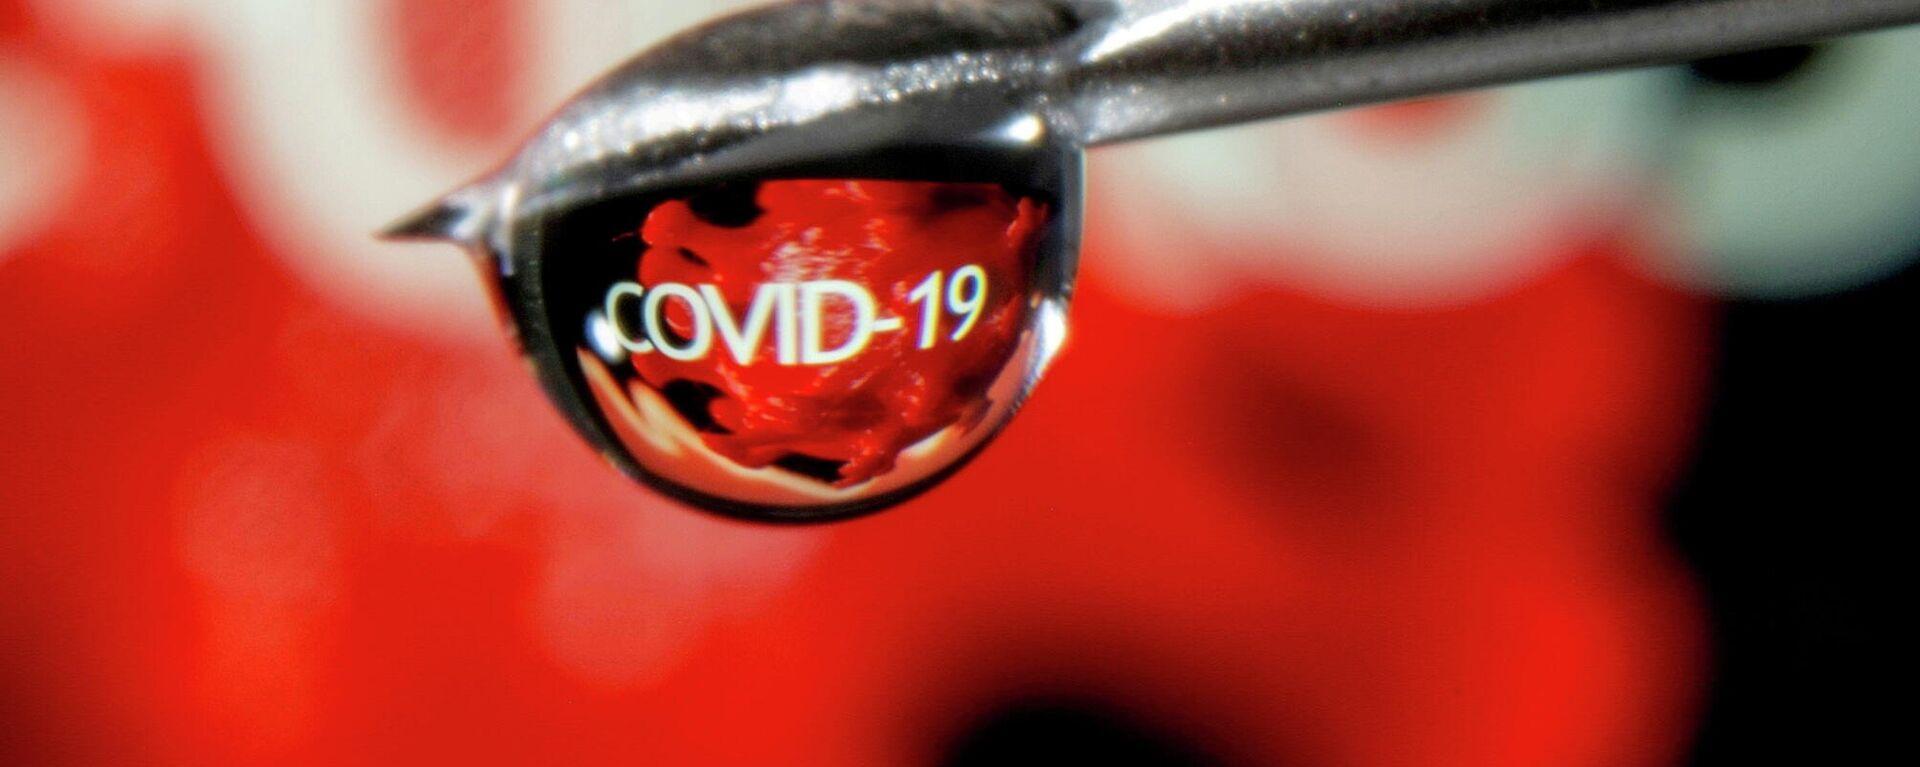 Слово COVID-19 в капле на игле шприца - Sputnik Узбекистан, 1920, 02.07.2021